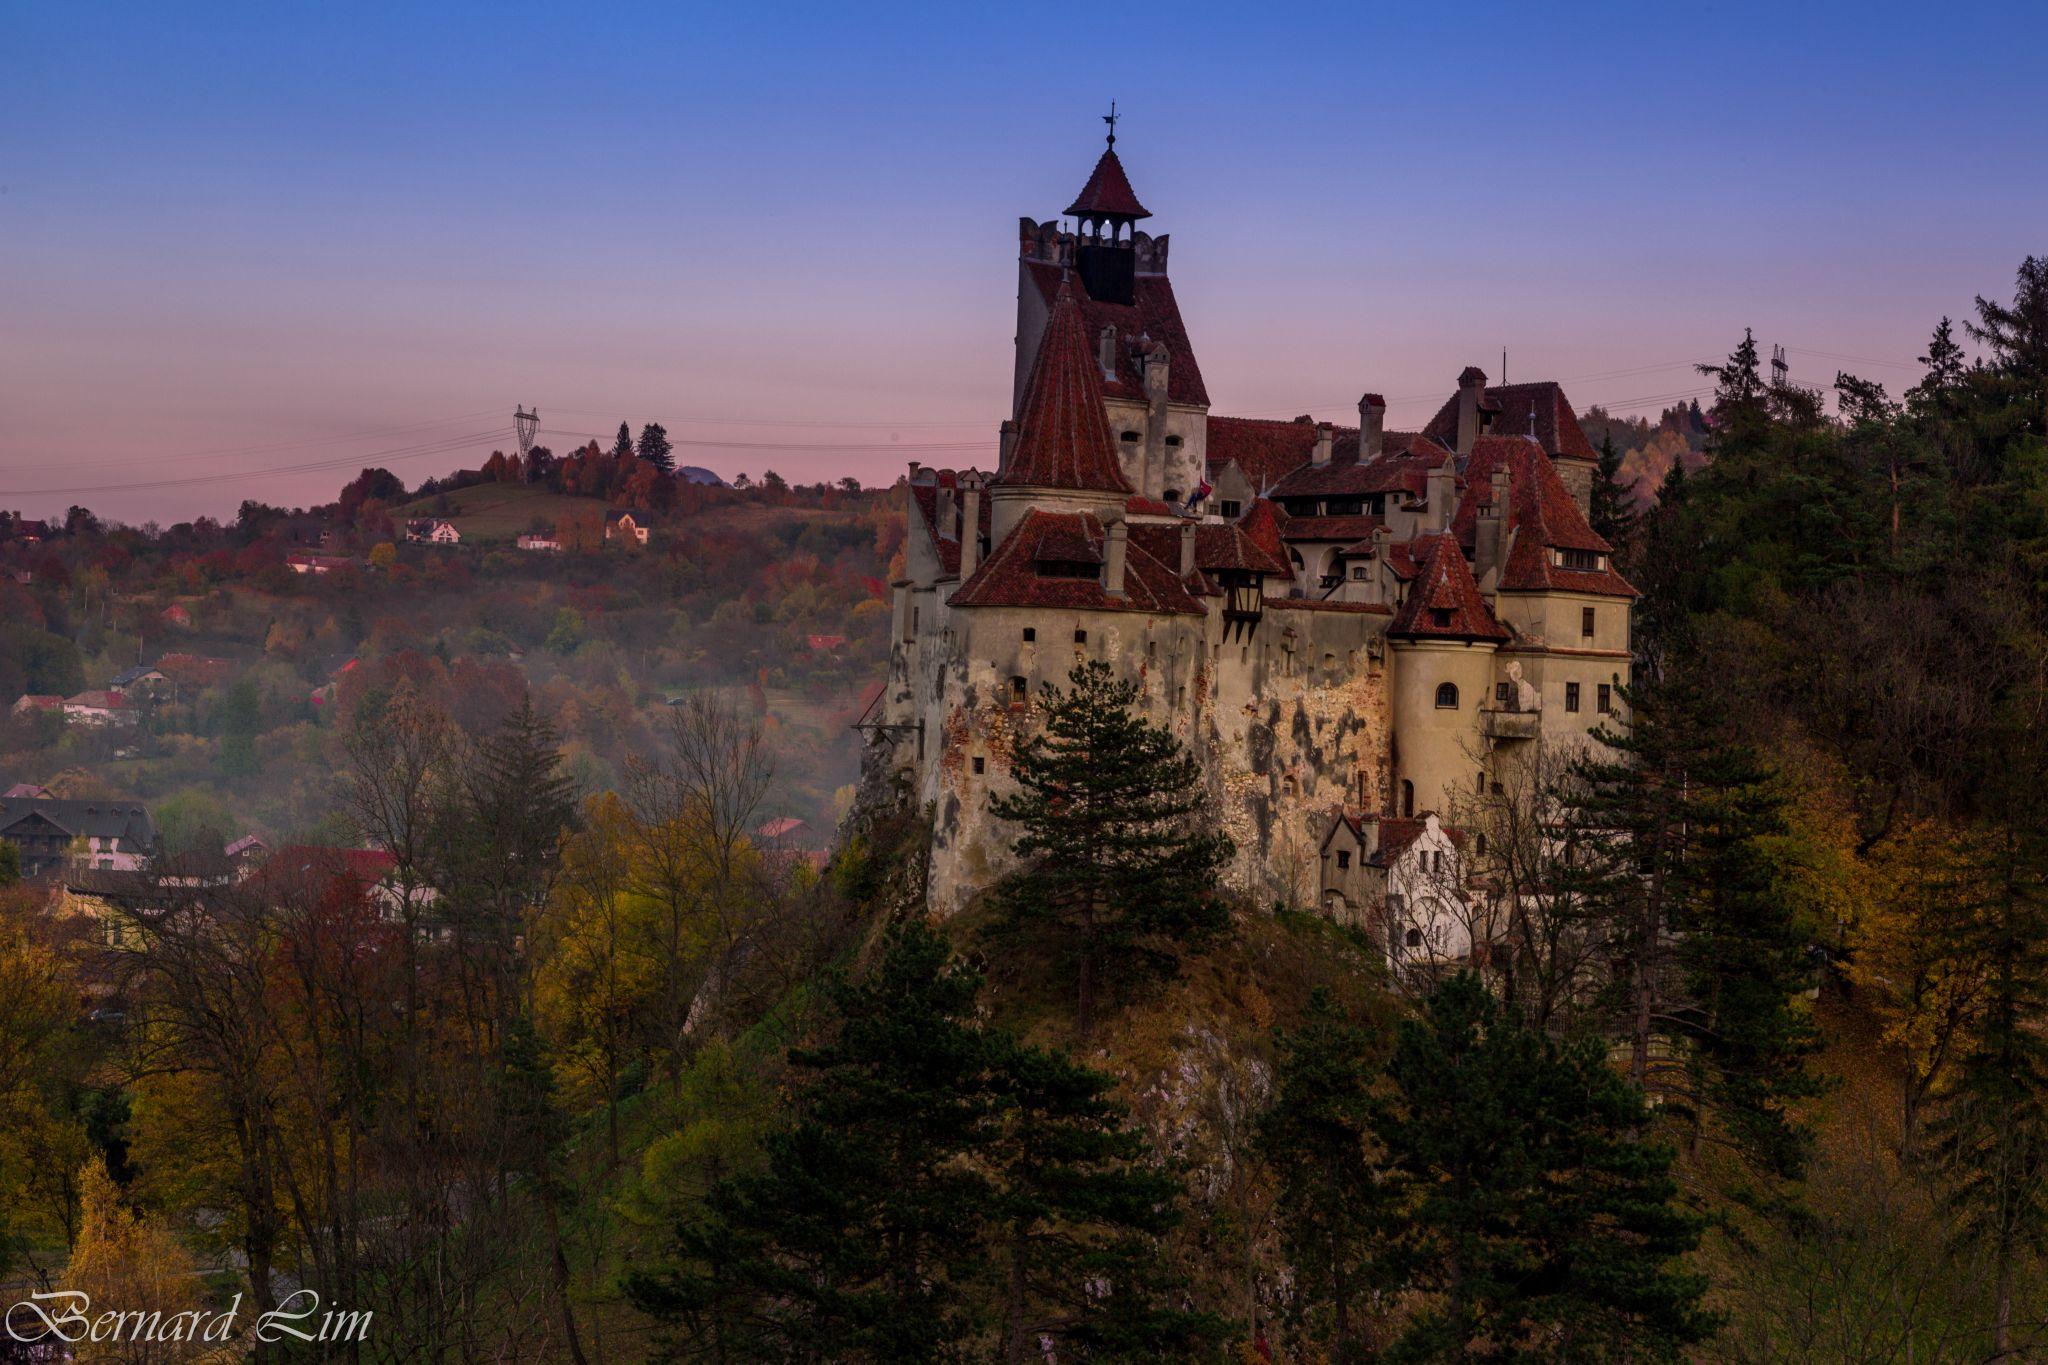 Vlad Dracula castle, Romania